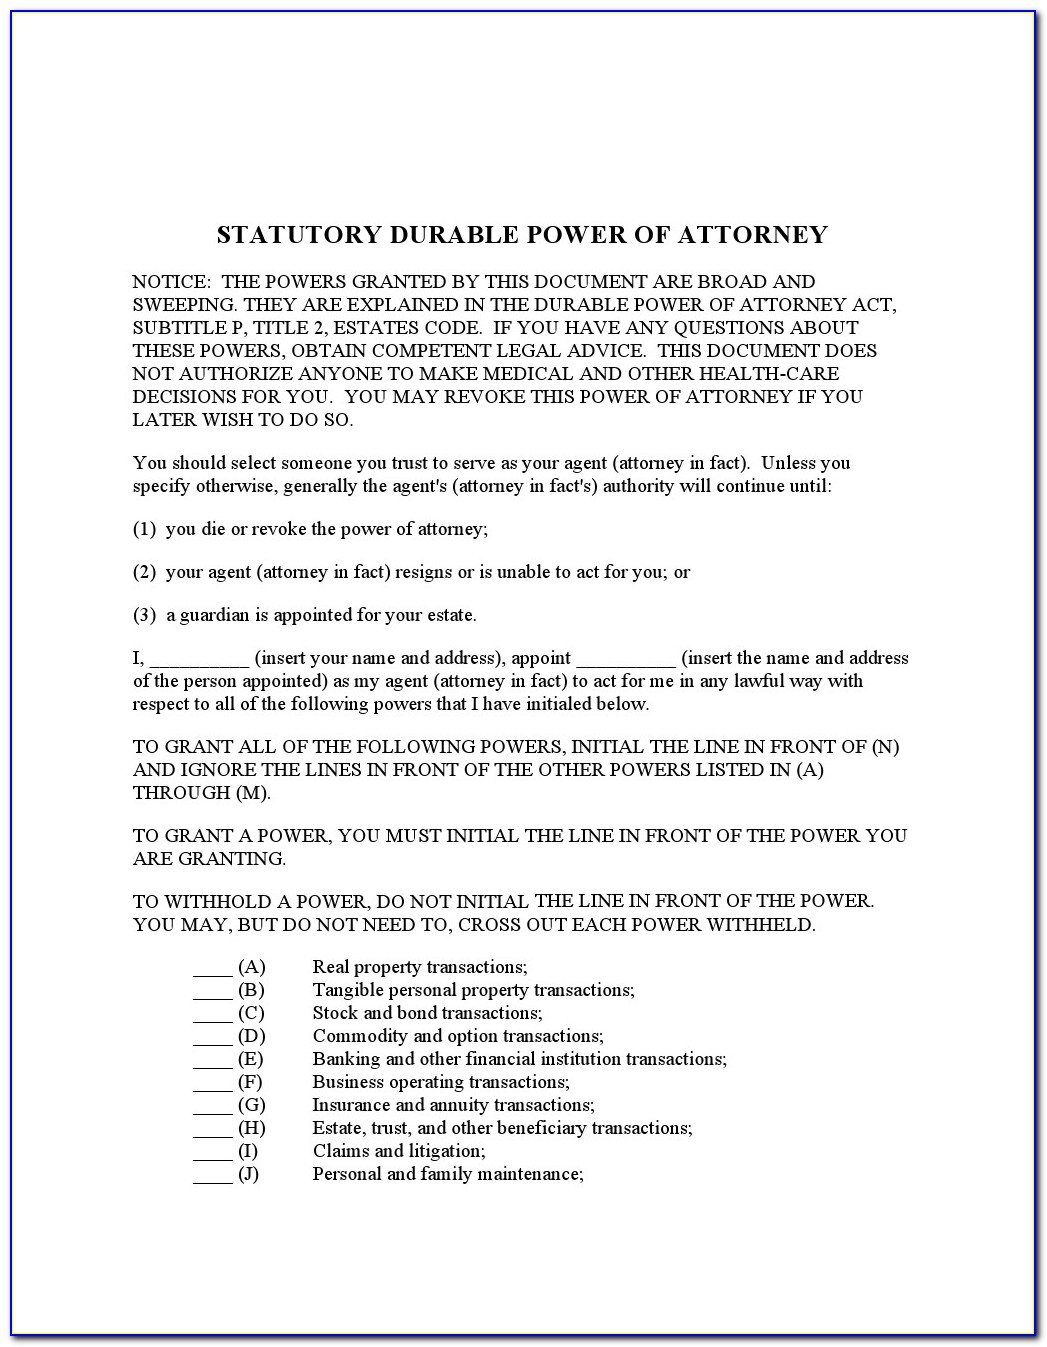 Idaho Statutory Durable Power Of Attorney Form